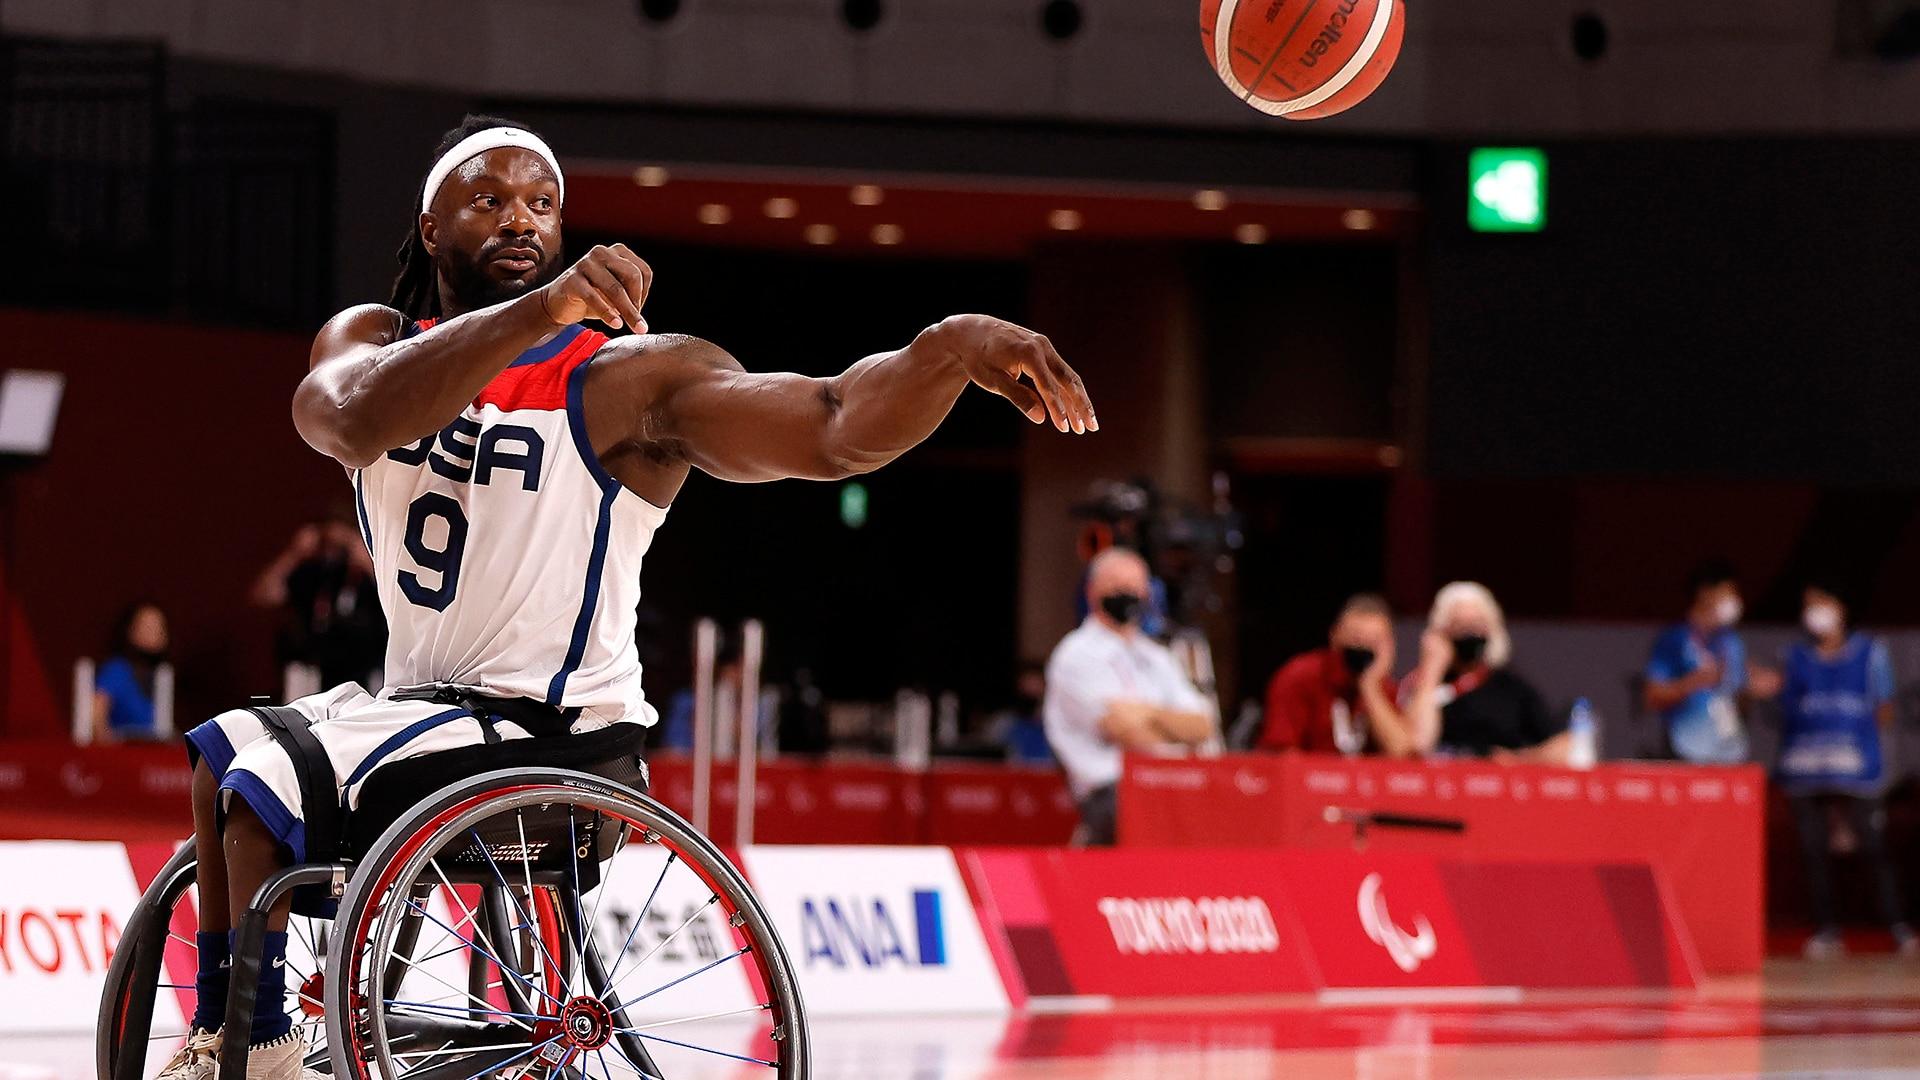 Matt Scott of Team United States passes the ball in the first half against Team Turkey during the men's Wheelchair Basketball quarterfinal